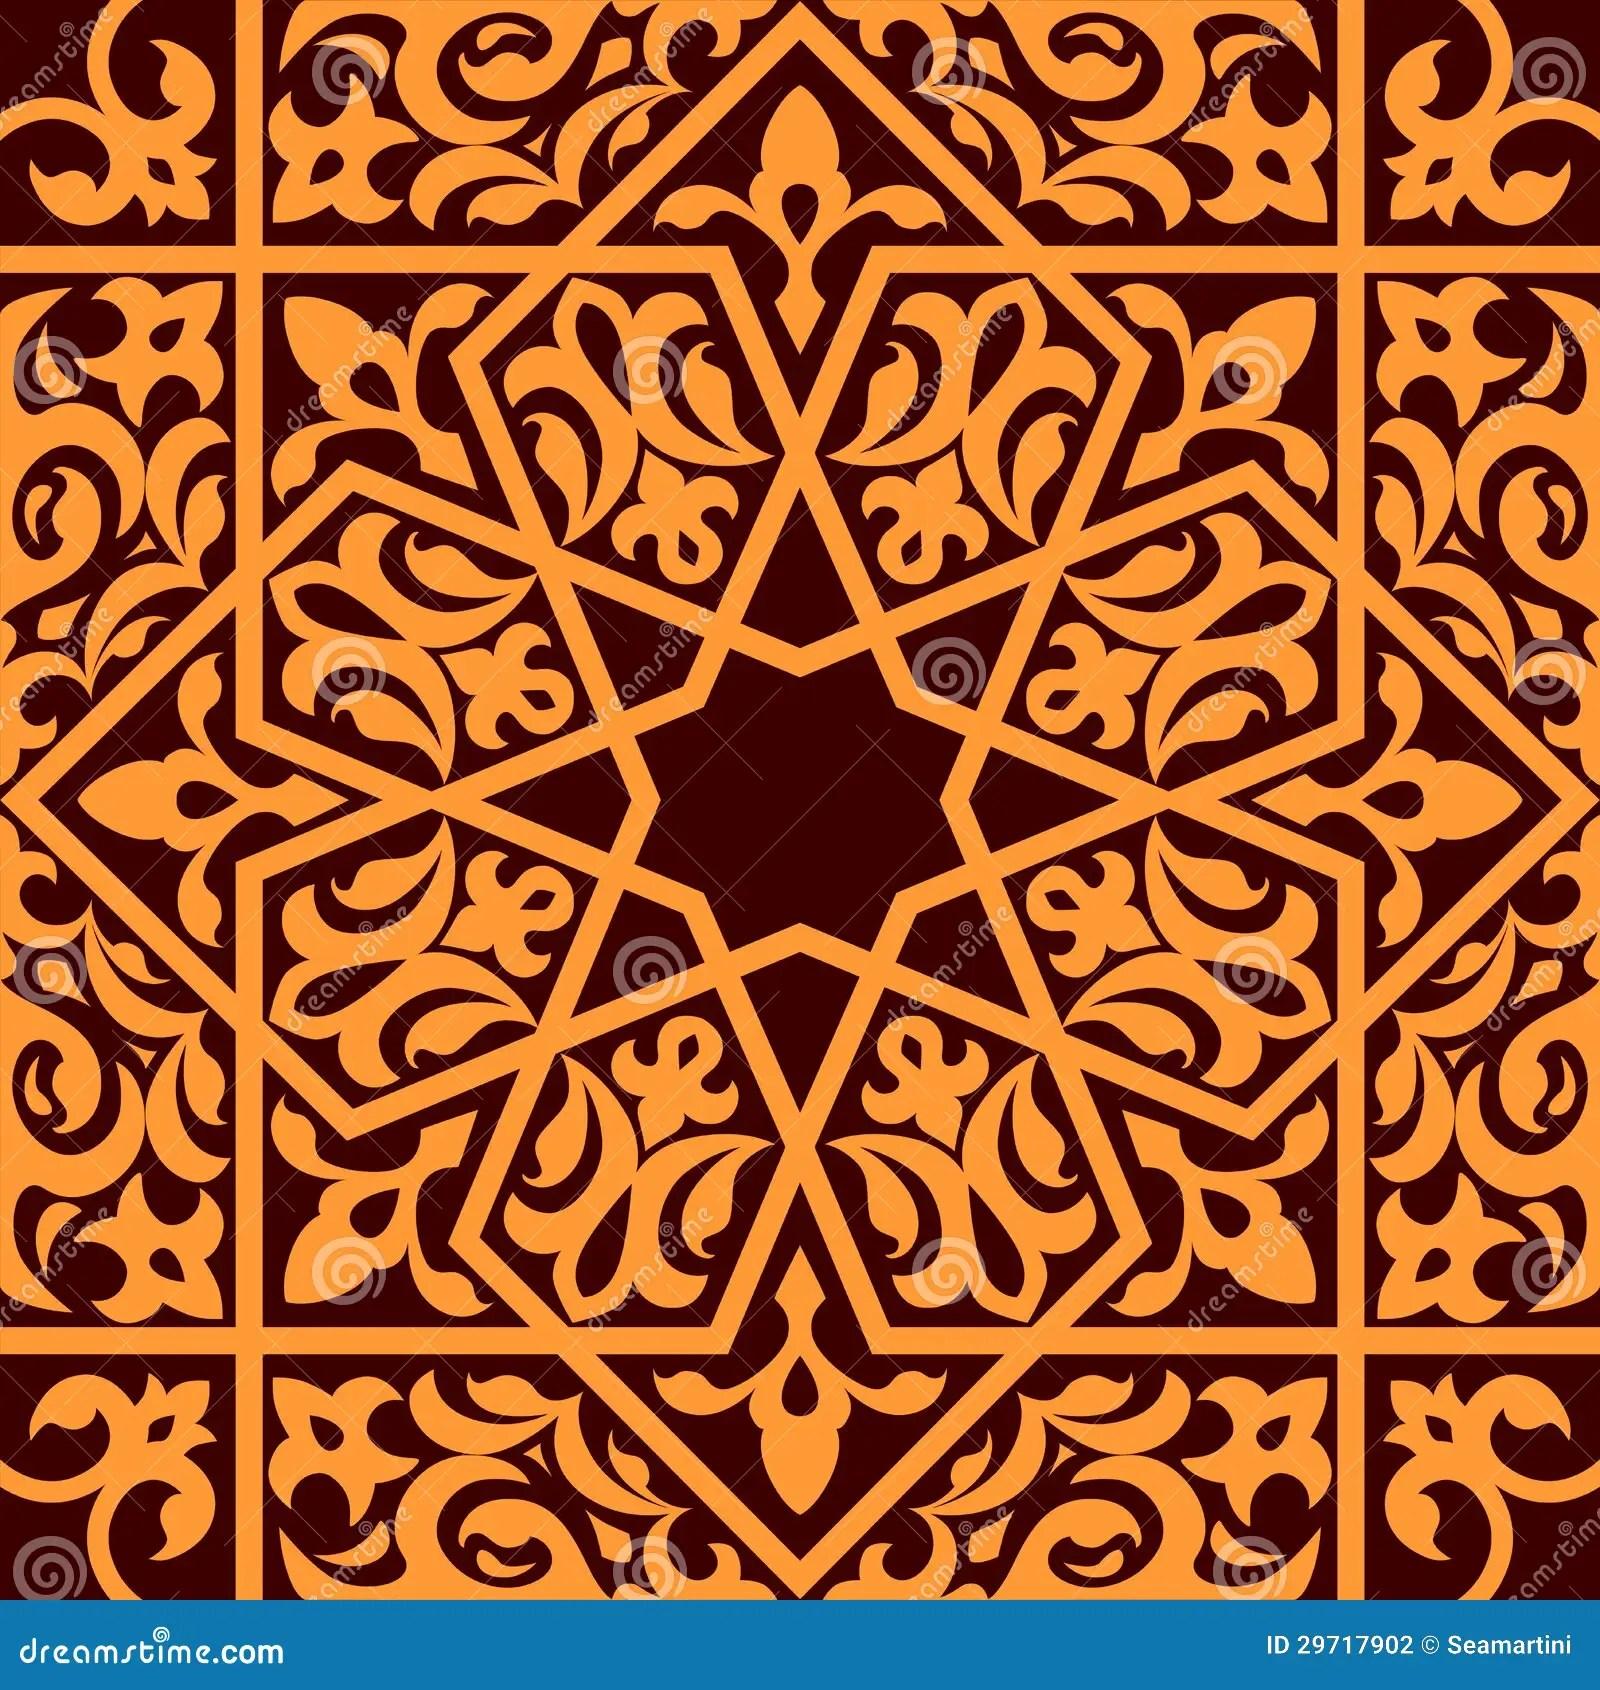 Islamic Arabesque Wallpaper